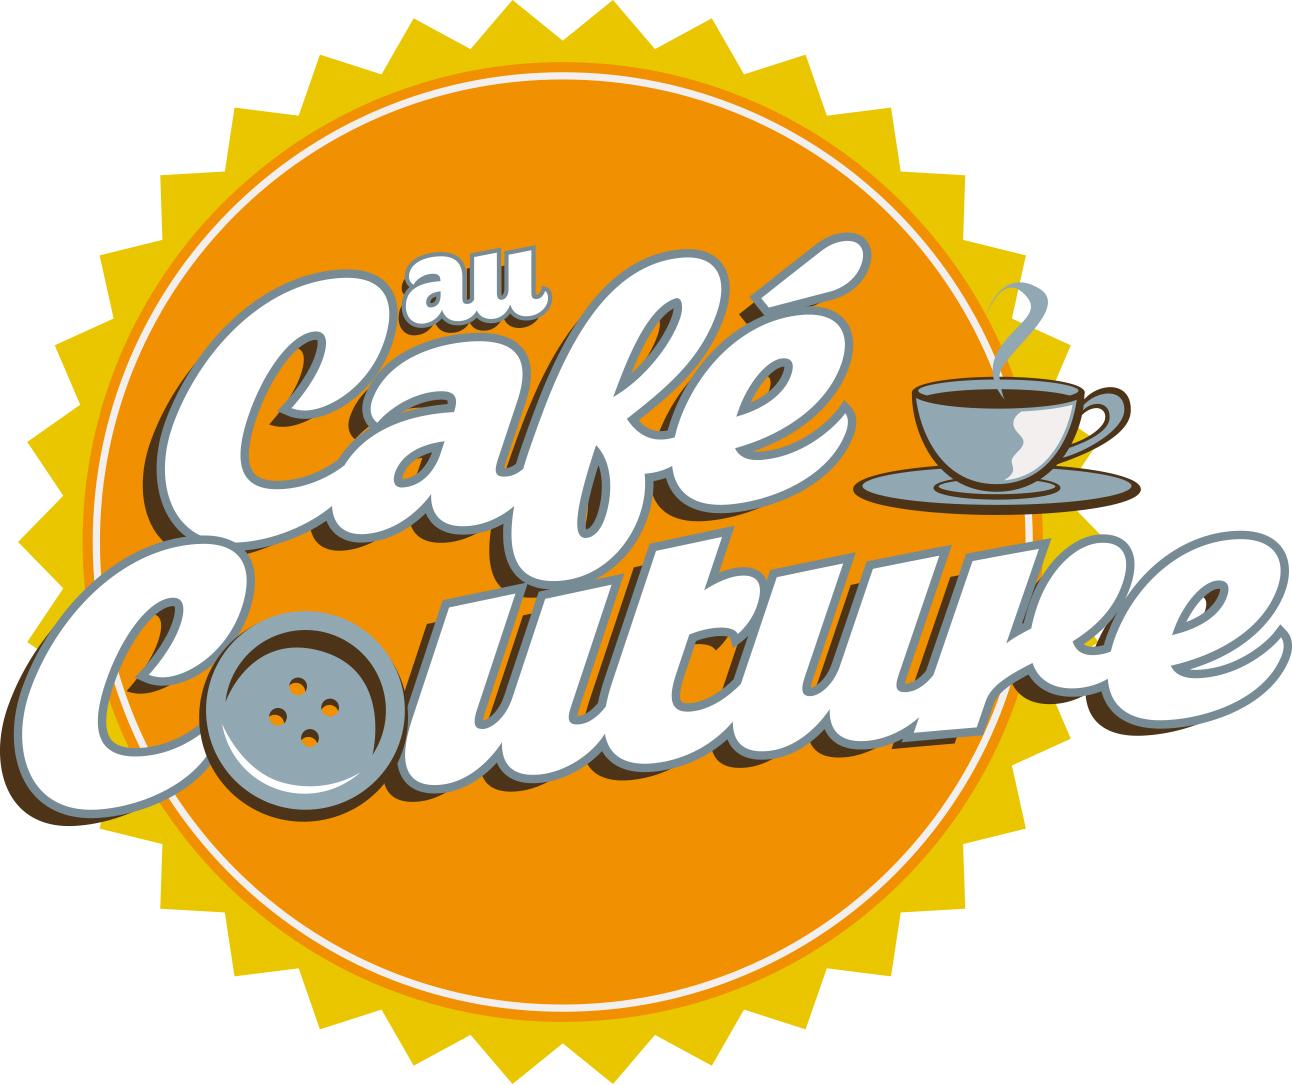 Au caf couture lilo - Logo valenciennes ...